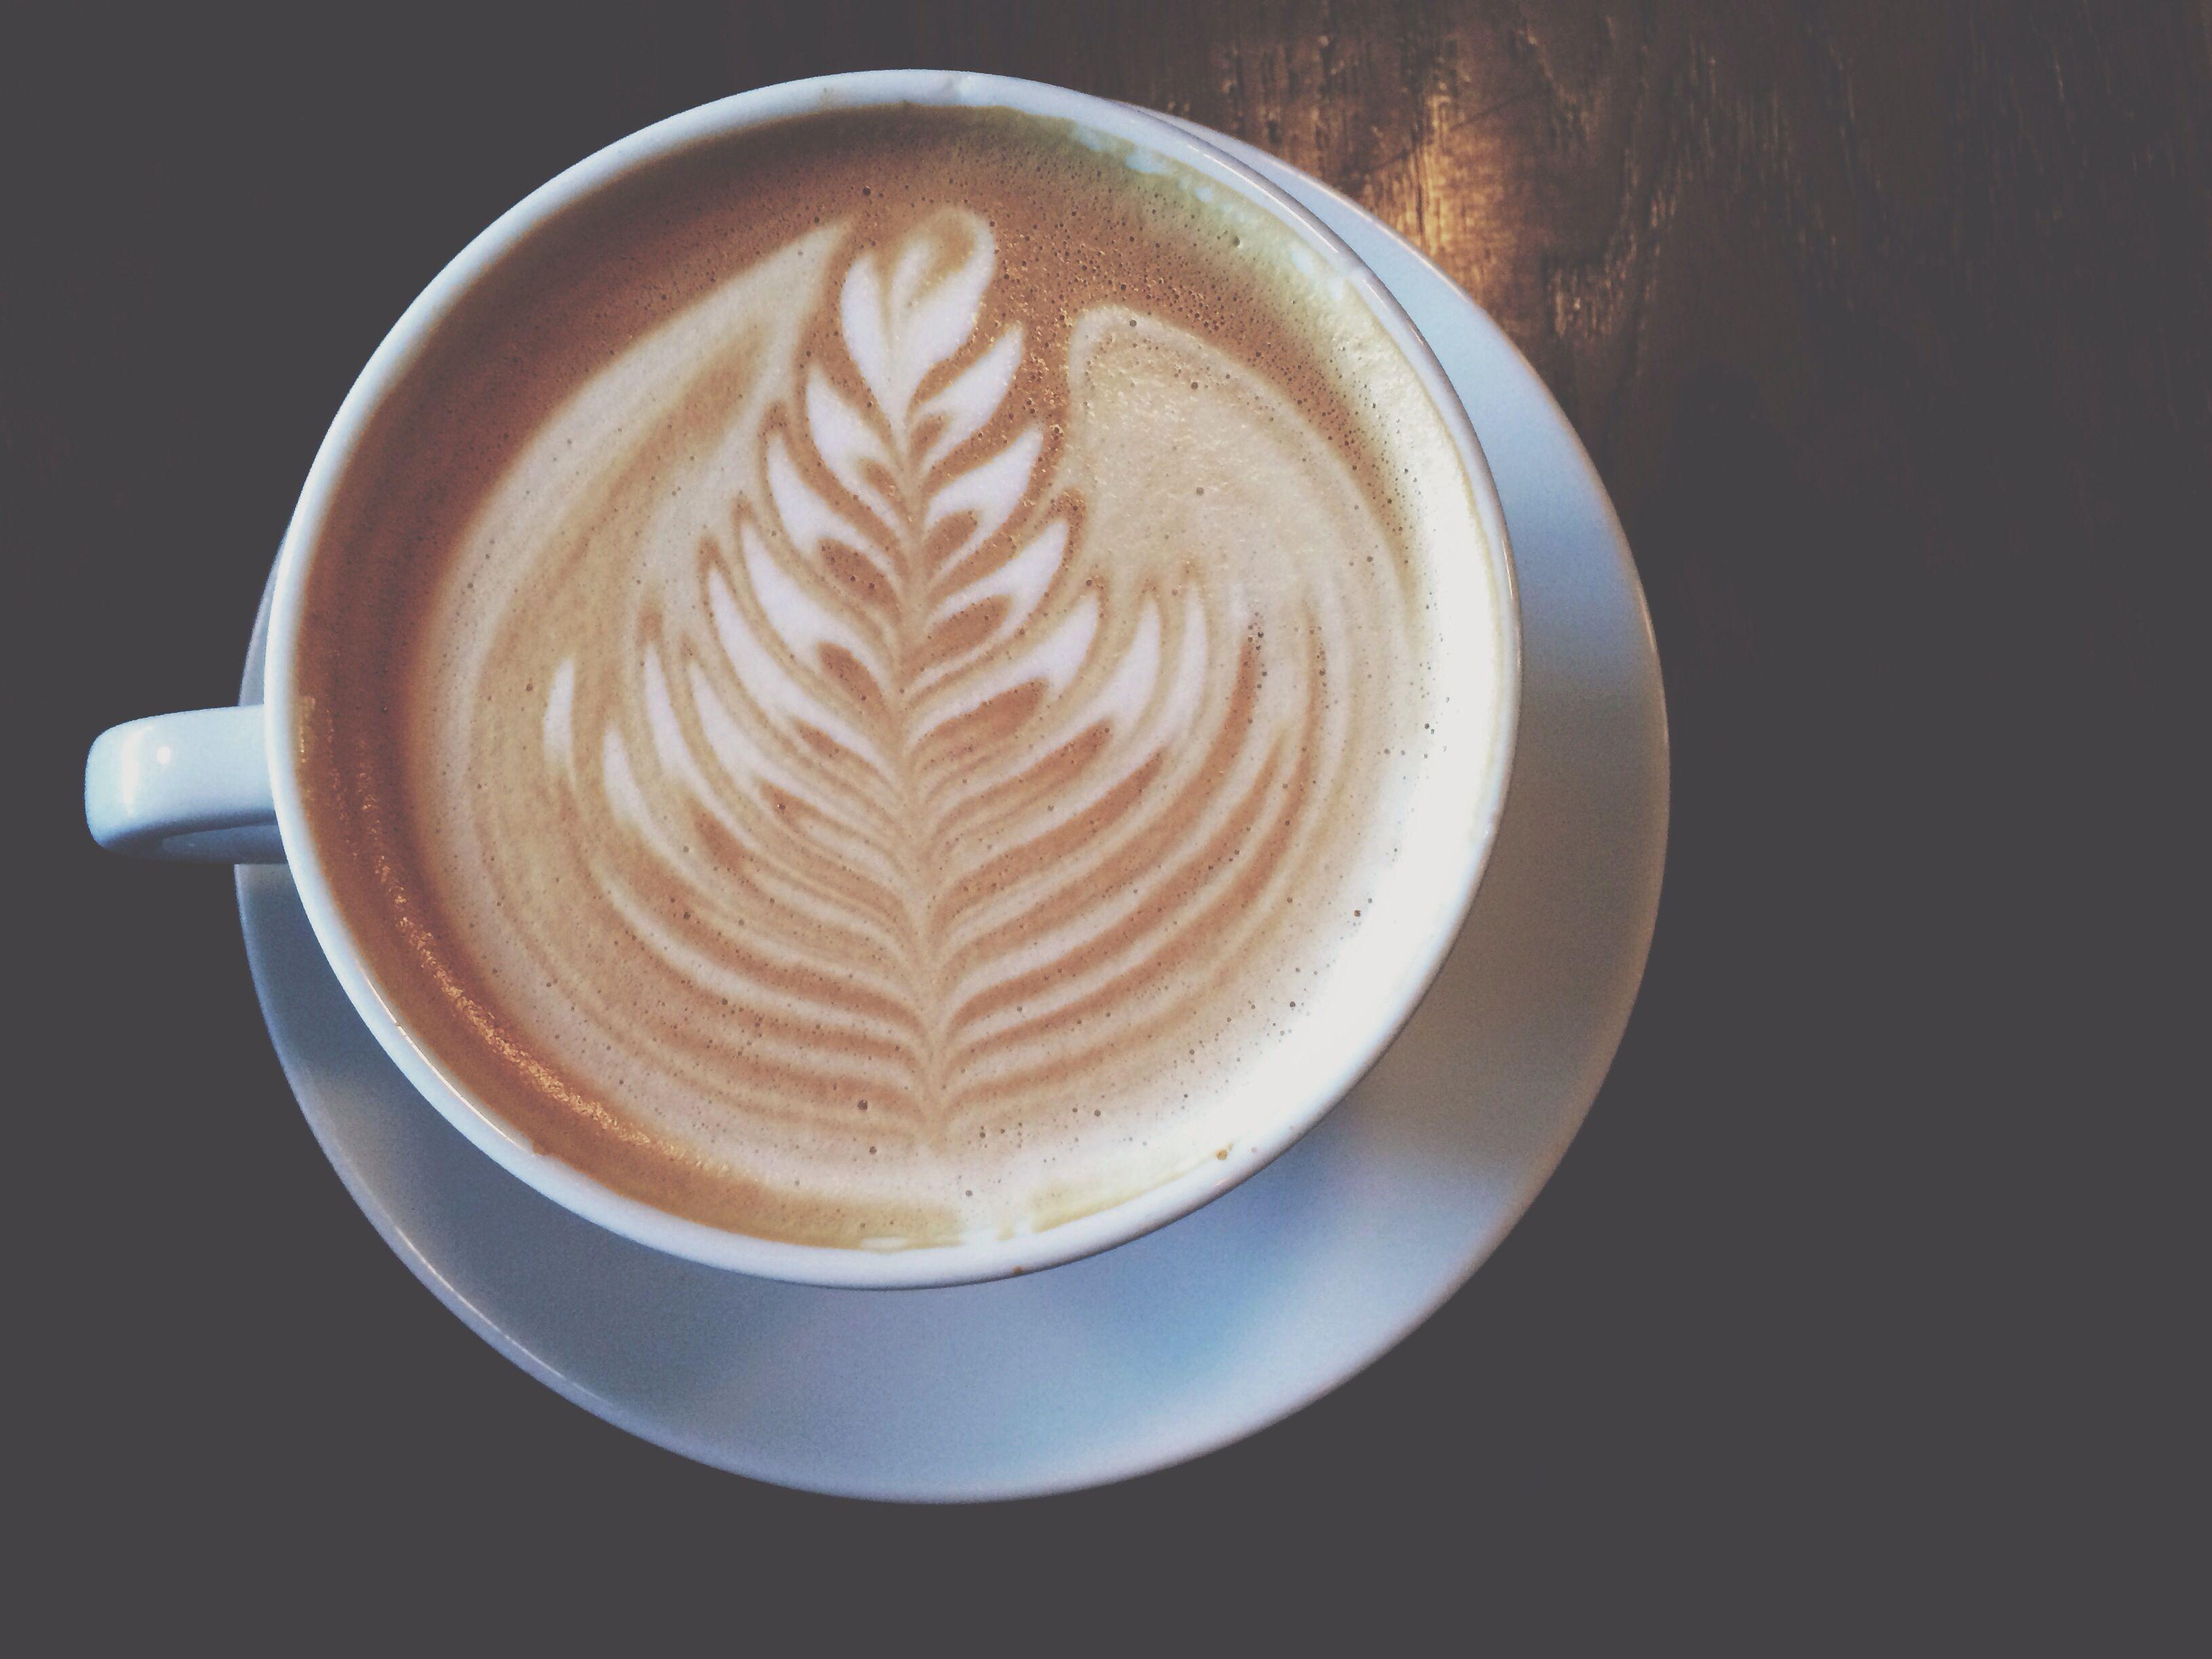 Lavender latte from spyhouse, yum yum.